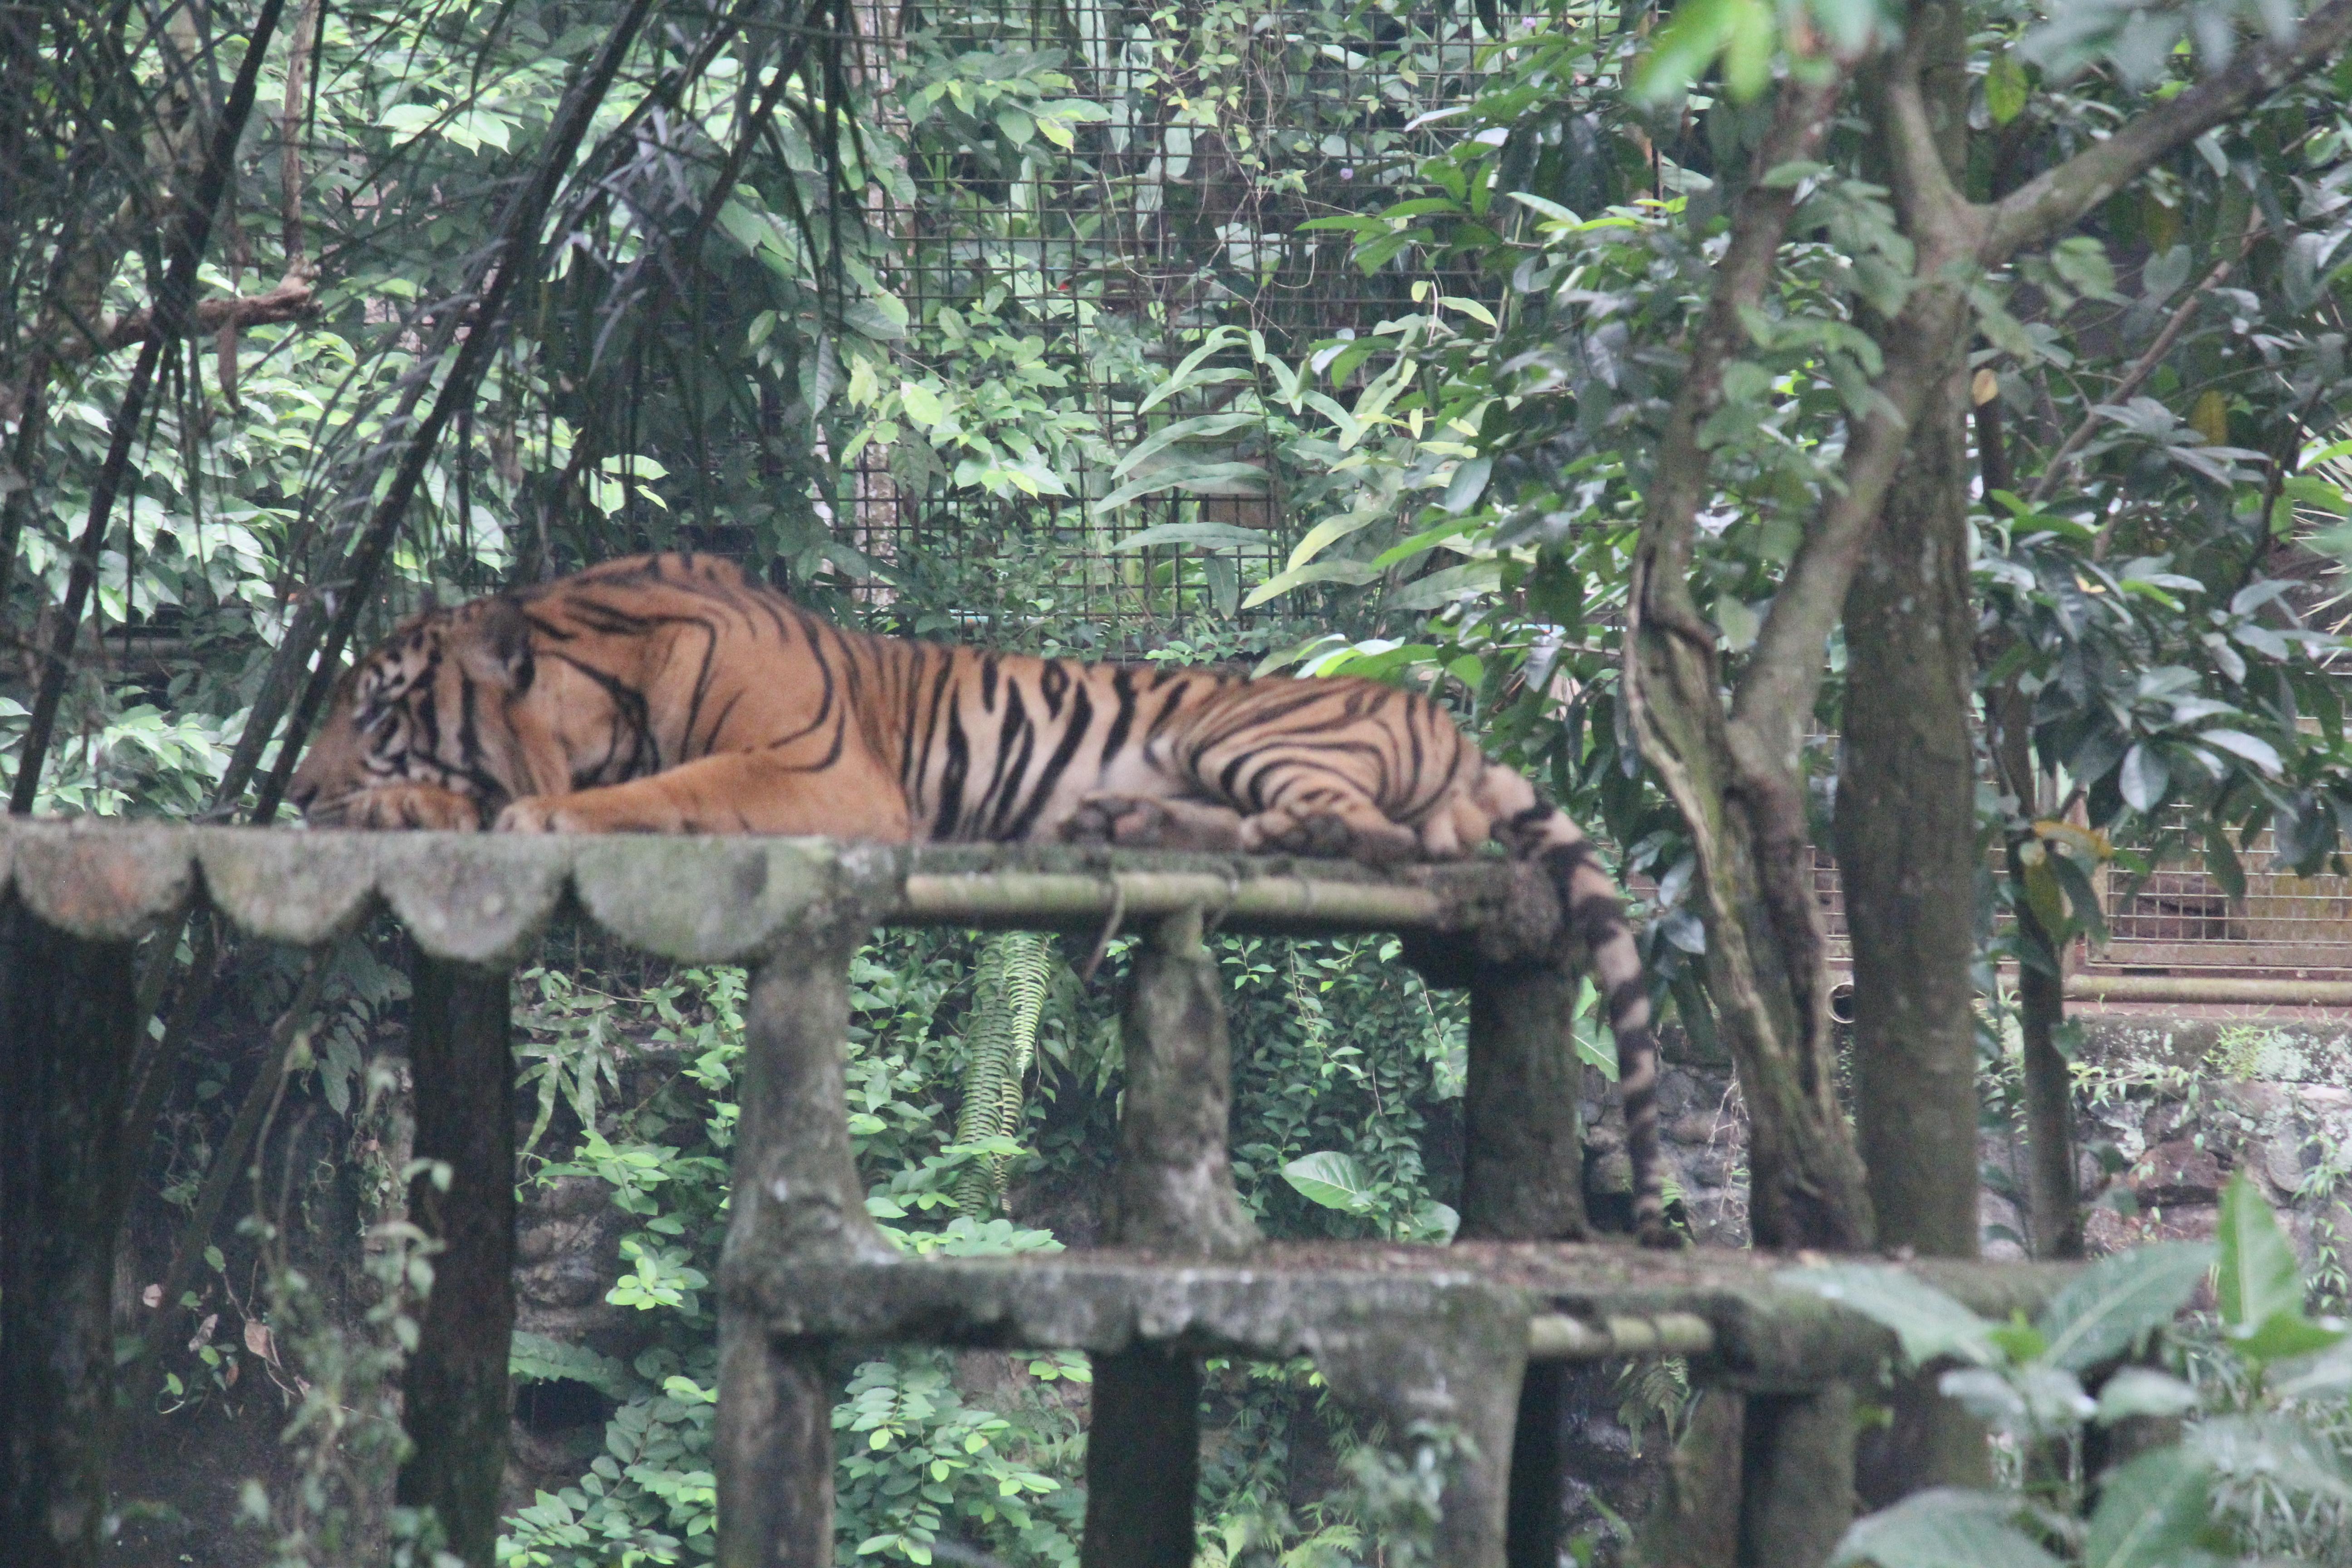 Berwisata Kebun Binatang Ragunan Jakarta Selatan Bagus Catur Prasetyo Foto